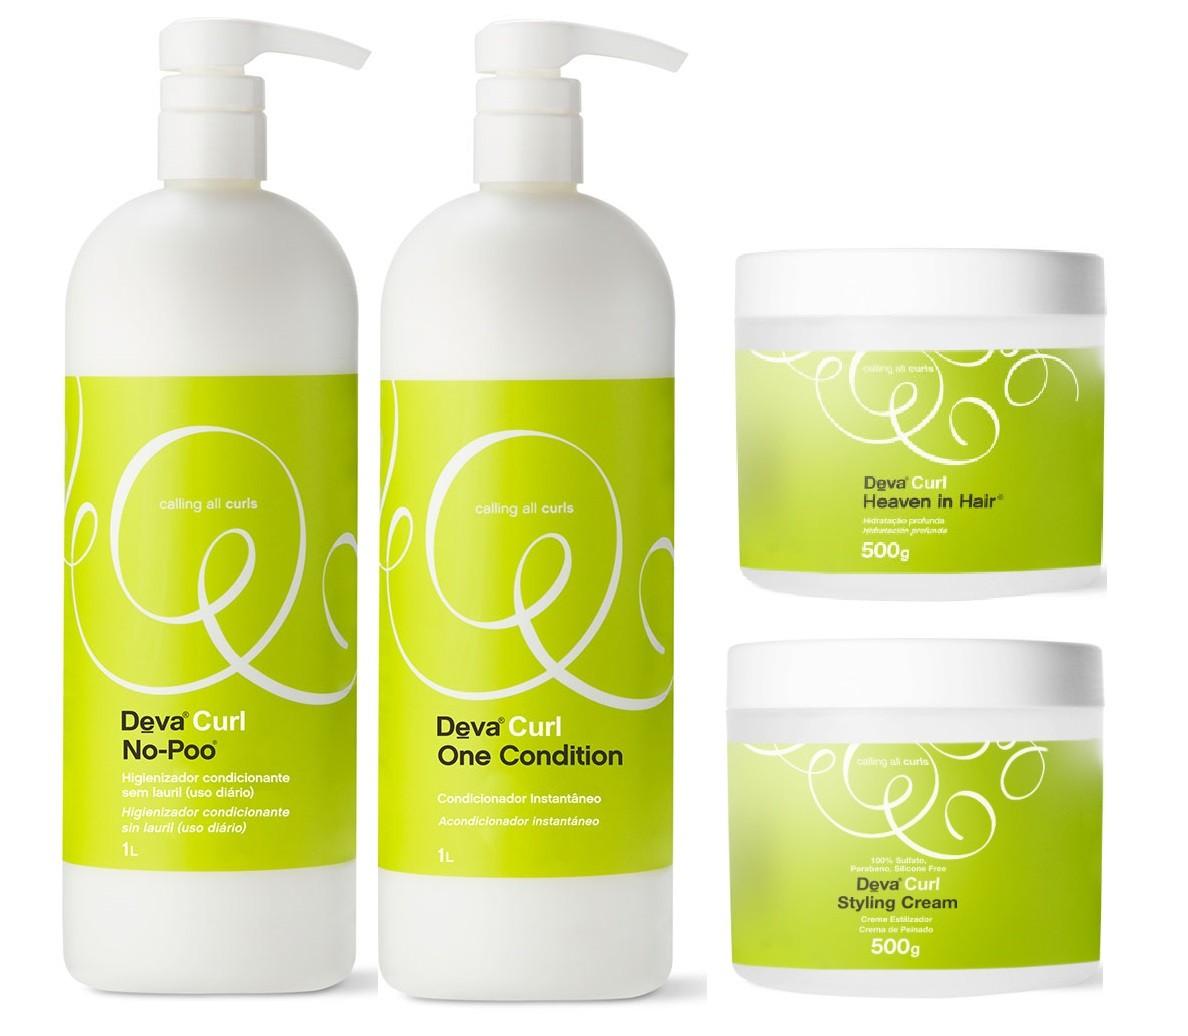 Deva Curl Original 2x1000, Styling Cream e Heaven Hair 500g